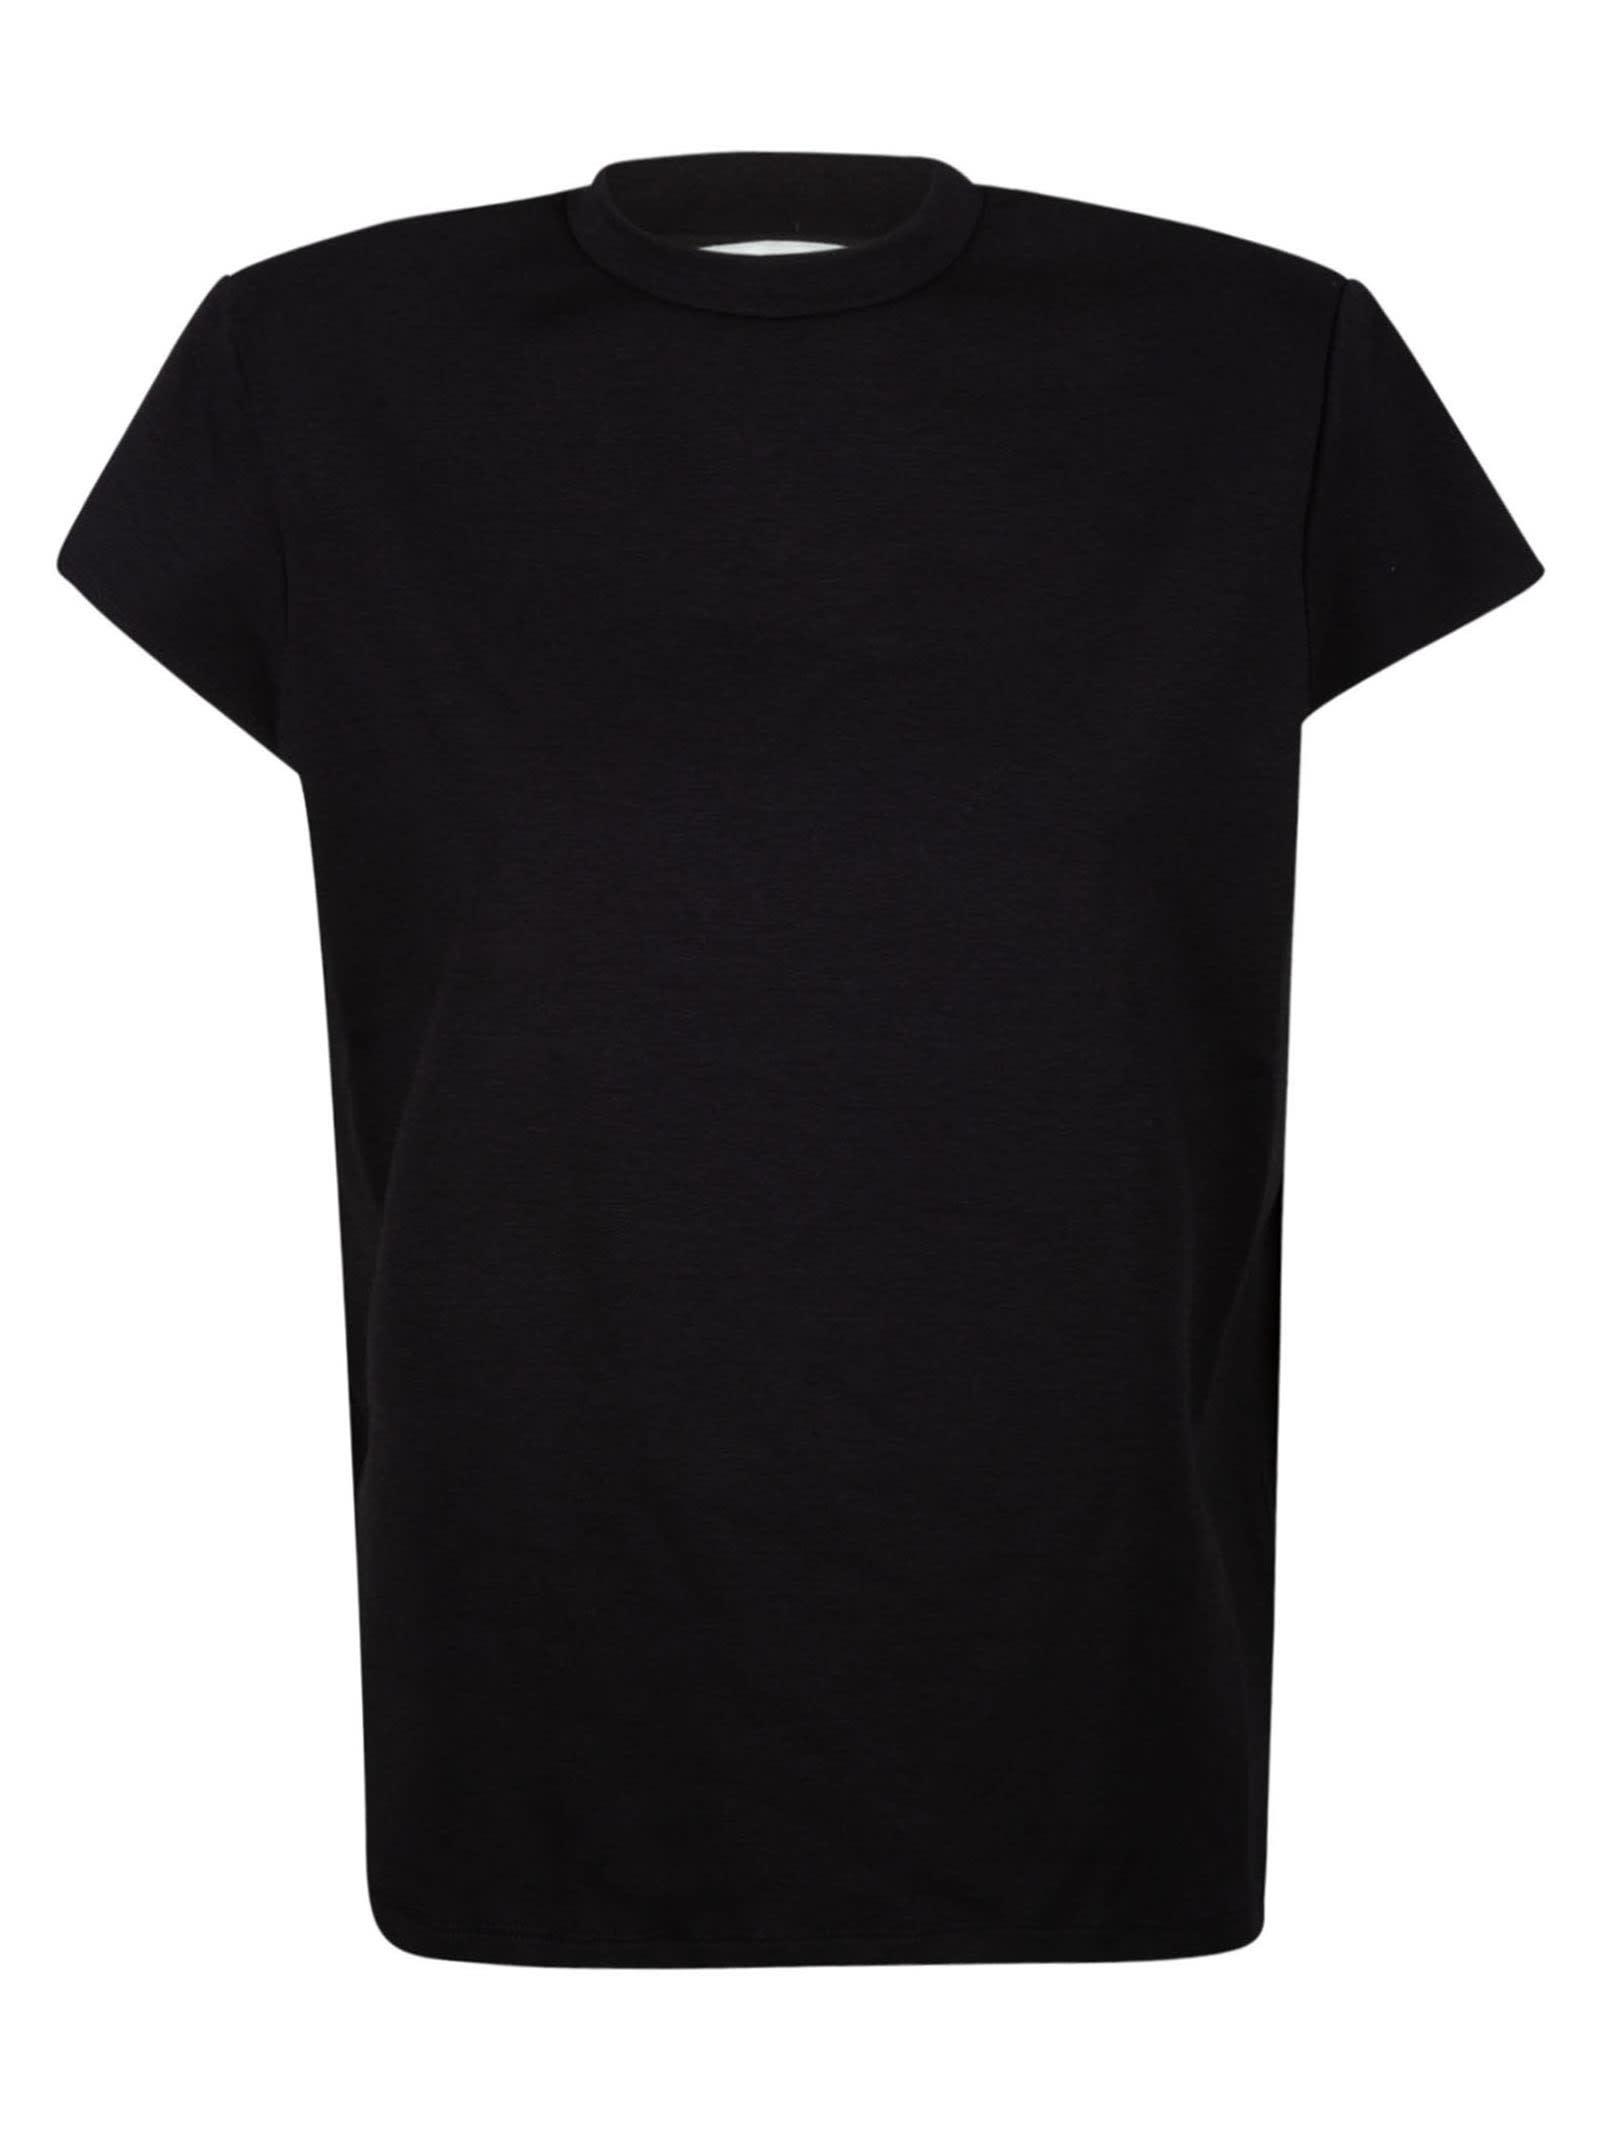 Imran T-shirt